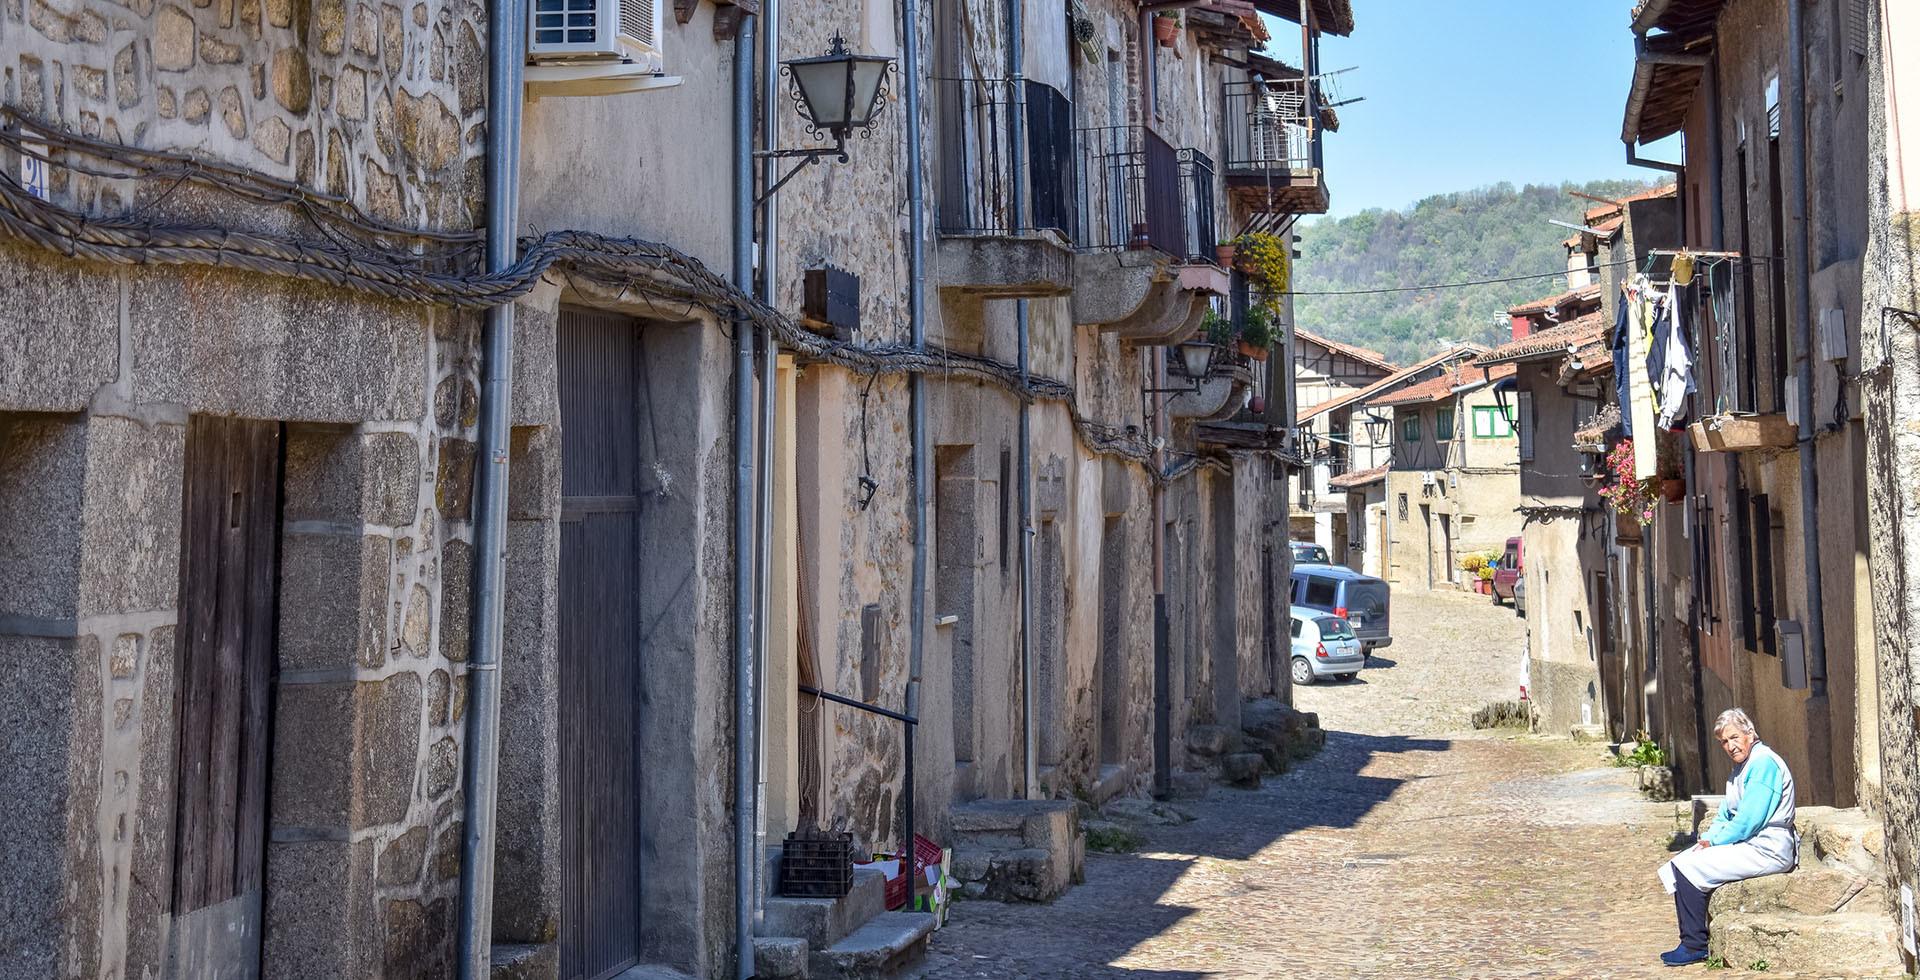 municipio pequeno sin empleo futuro densidad baja